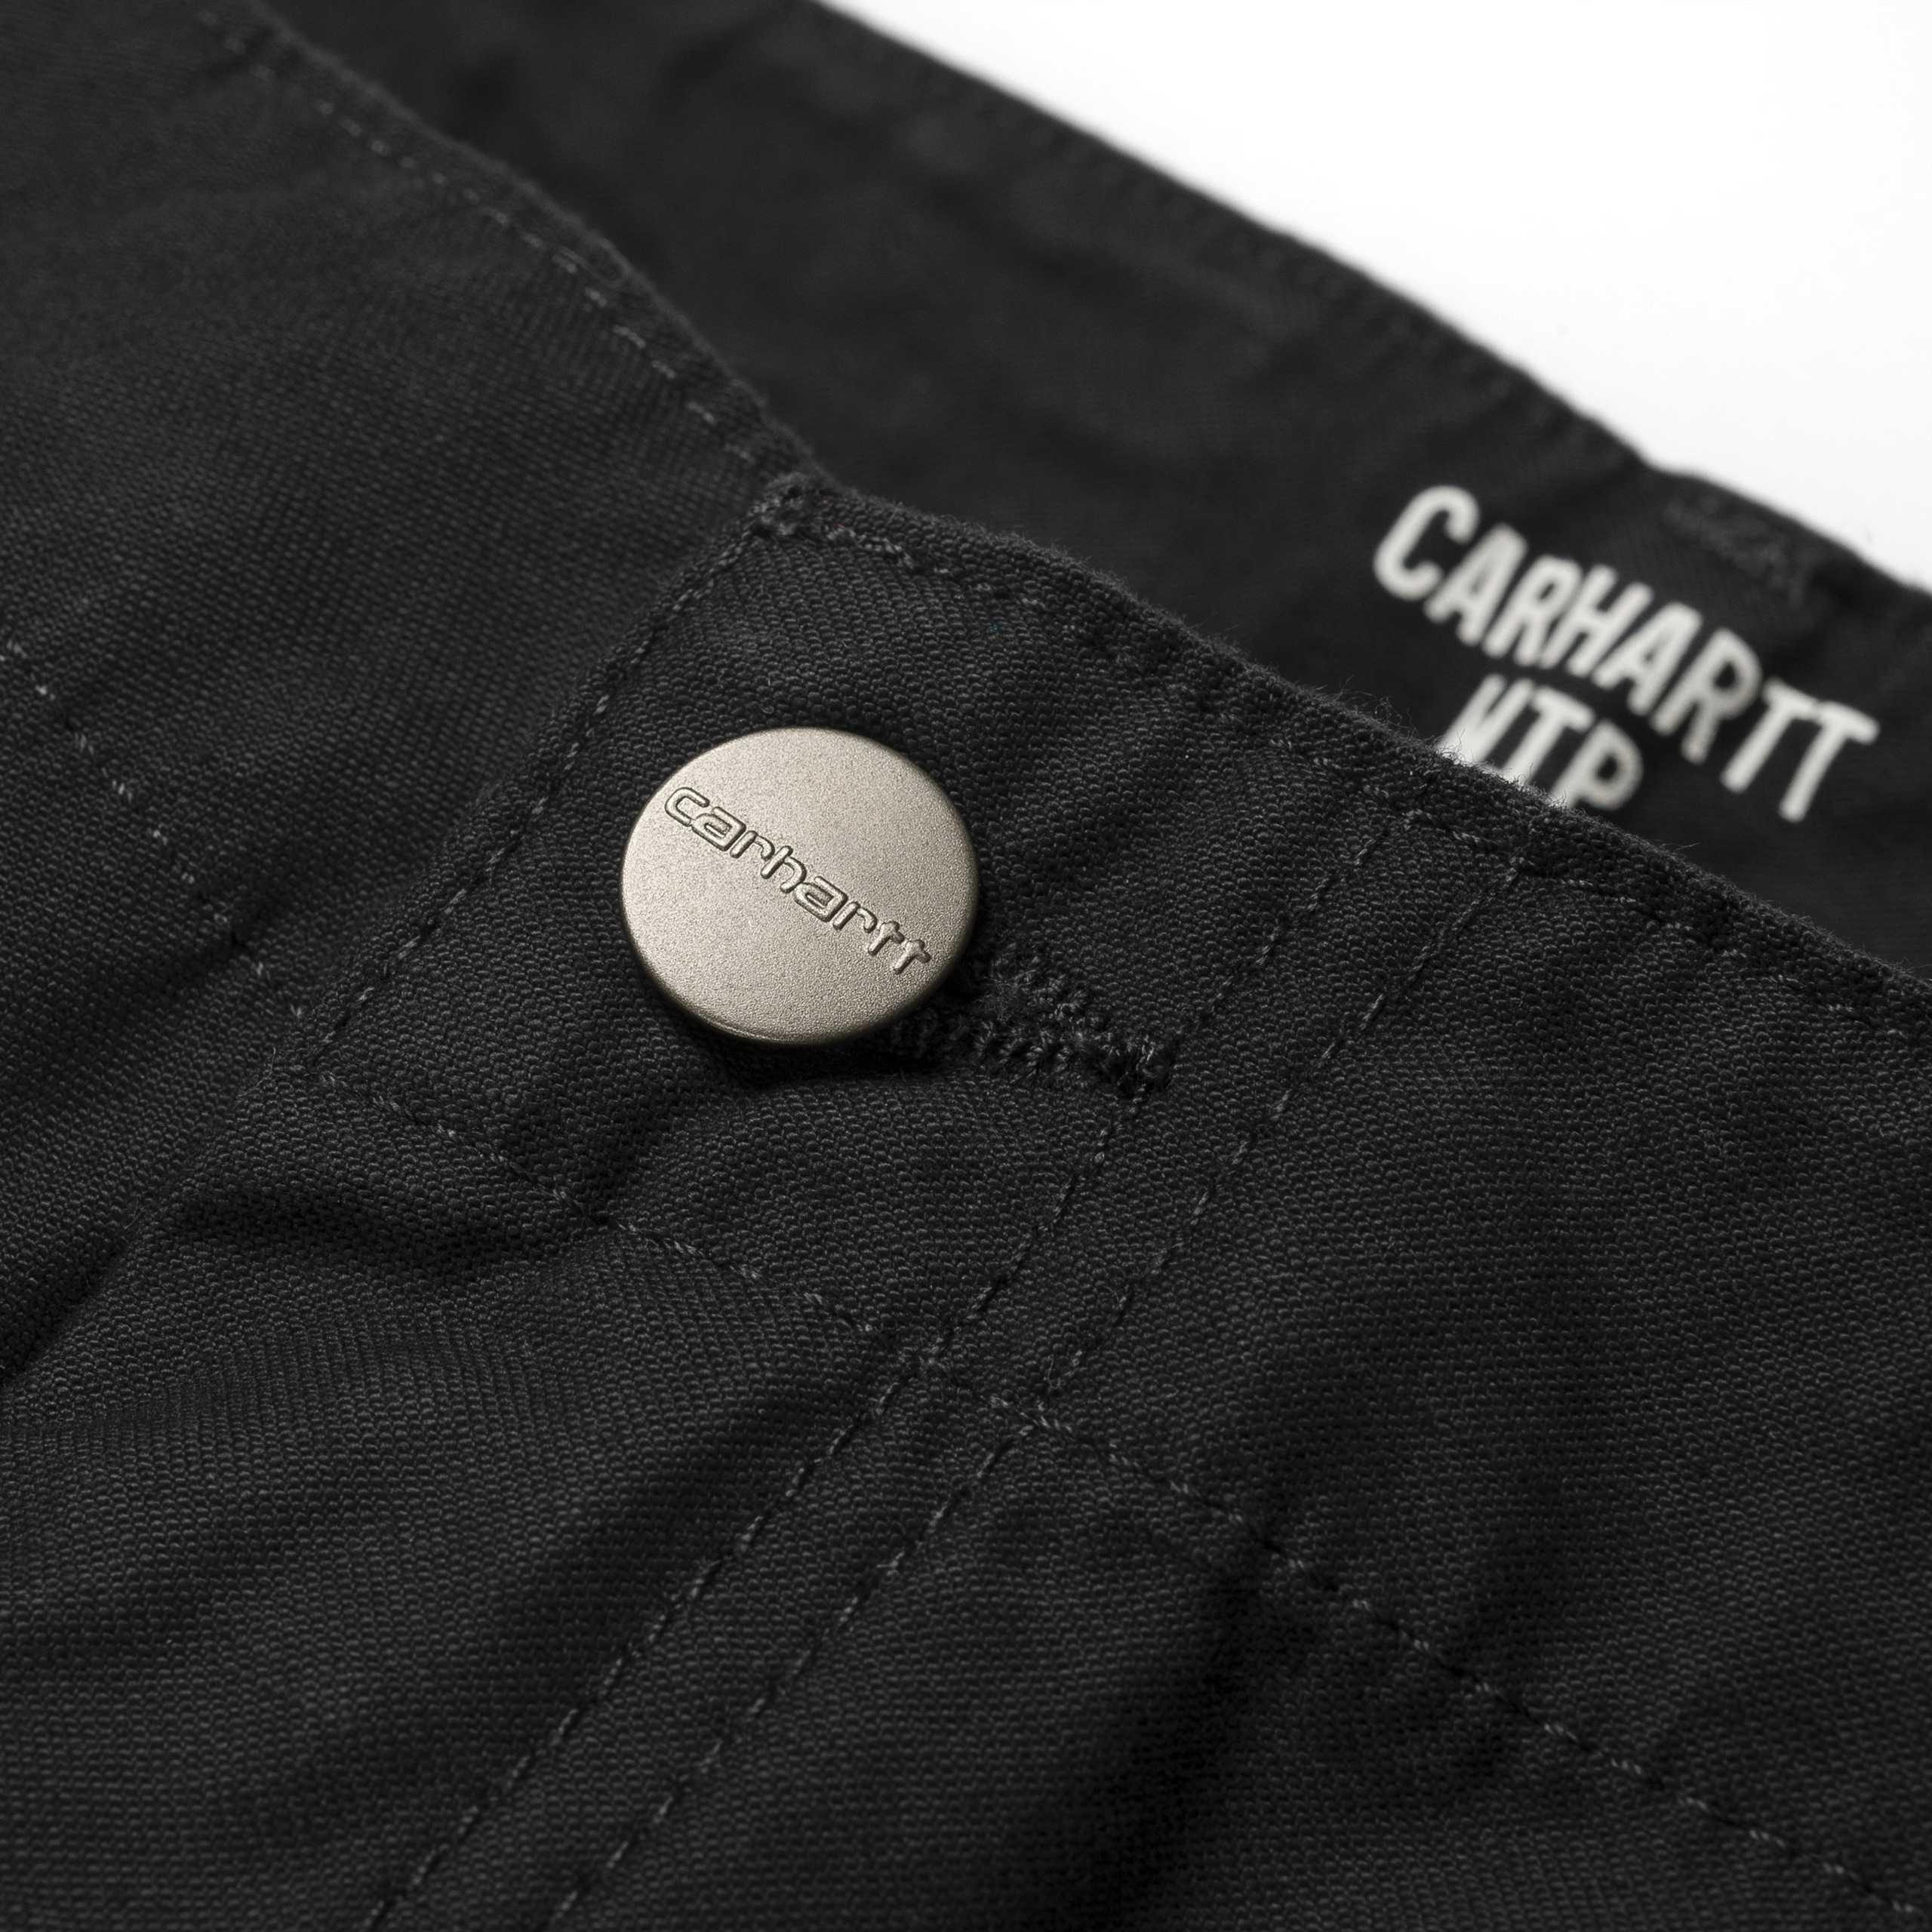 Carhartt Black Regular Cargo Pants